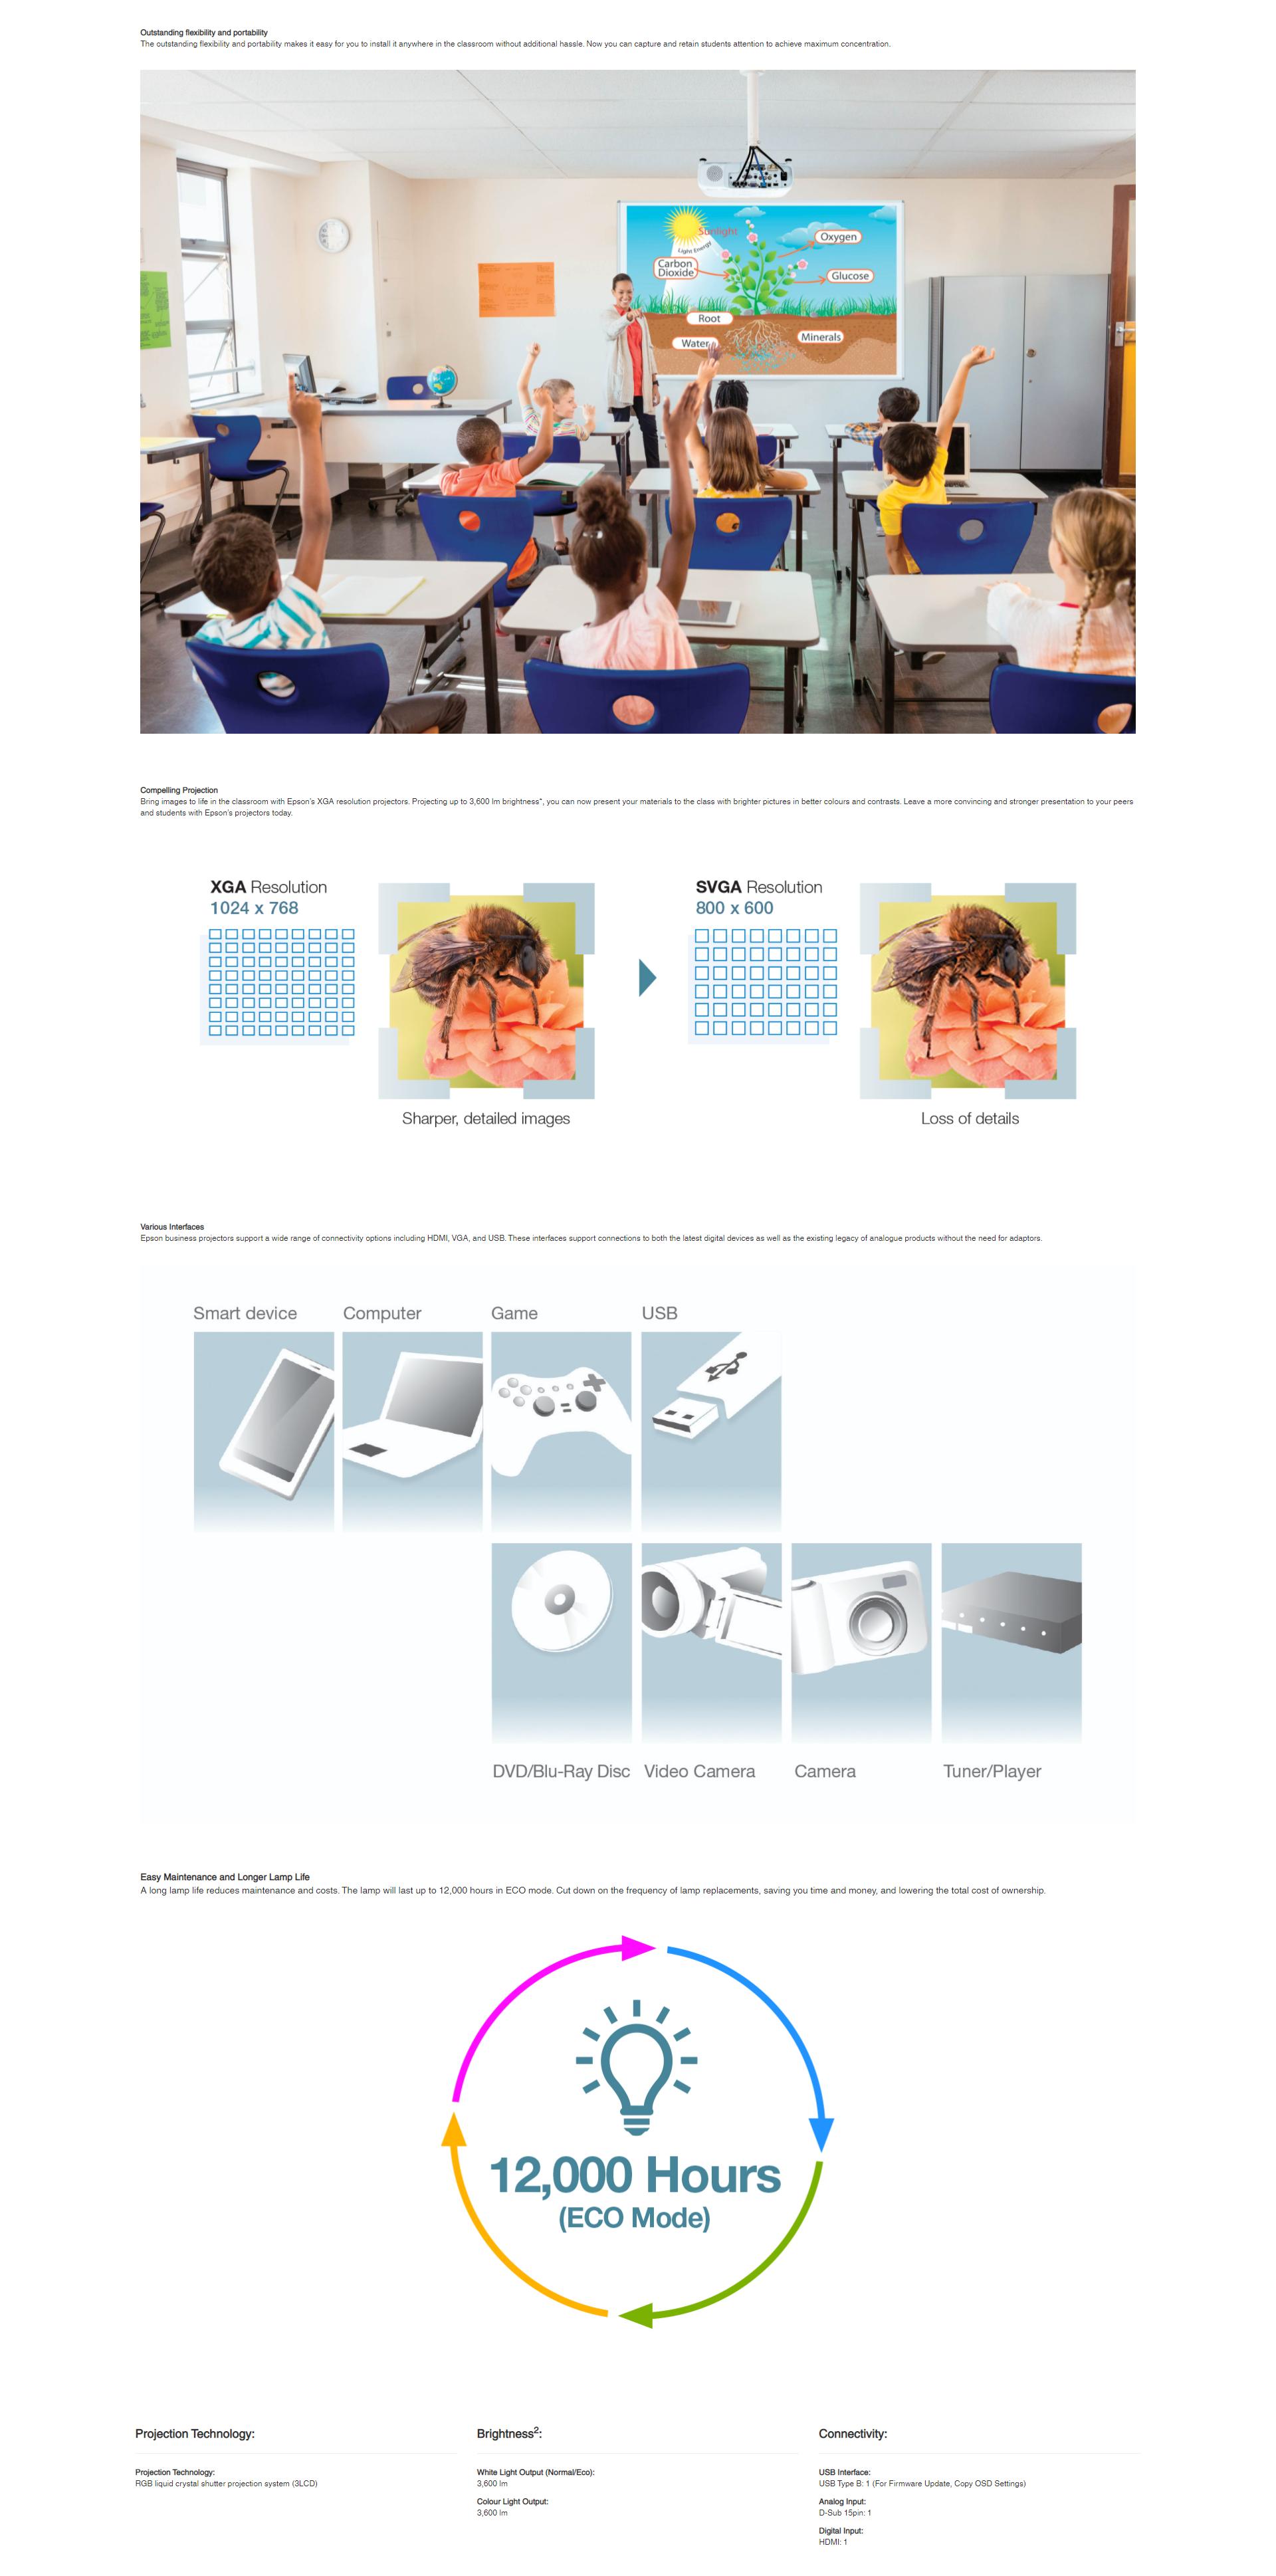 screencapture-epson-my-Projectors-Corporate-and-Education-Epson-EB-E10-XGA-3-LCD-Projector-p-V11-H97